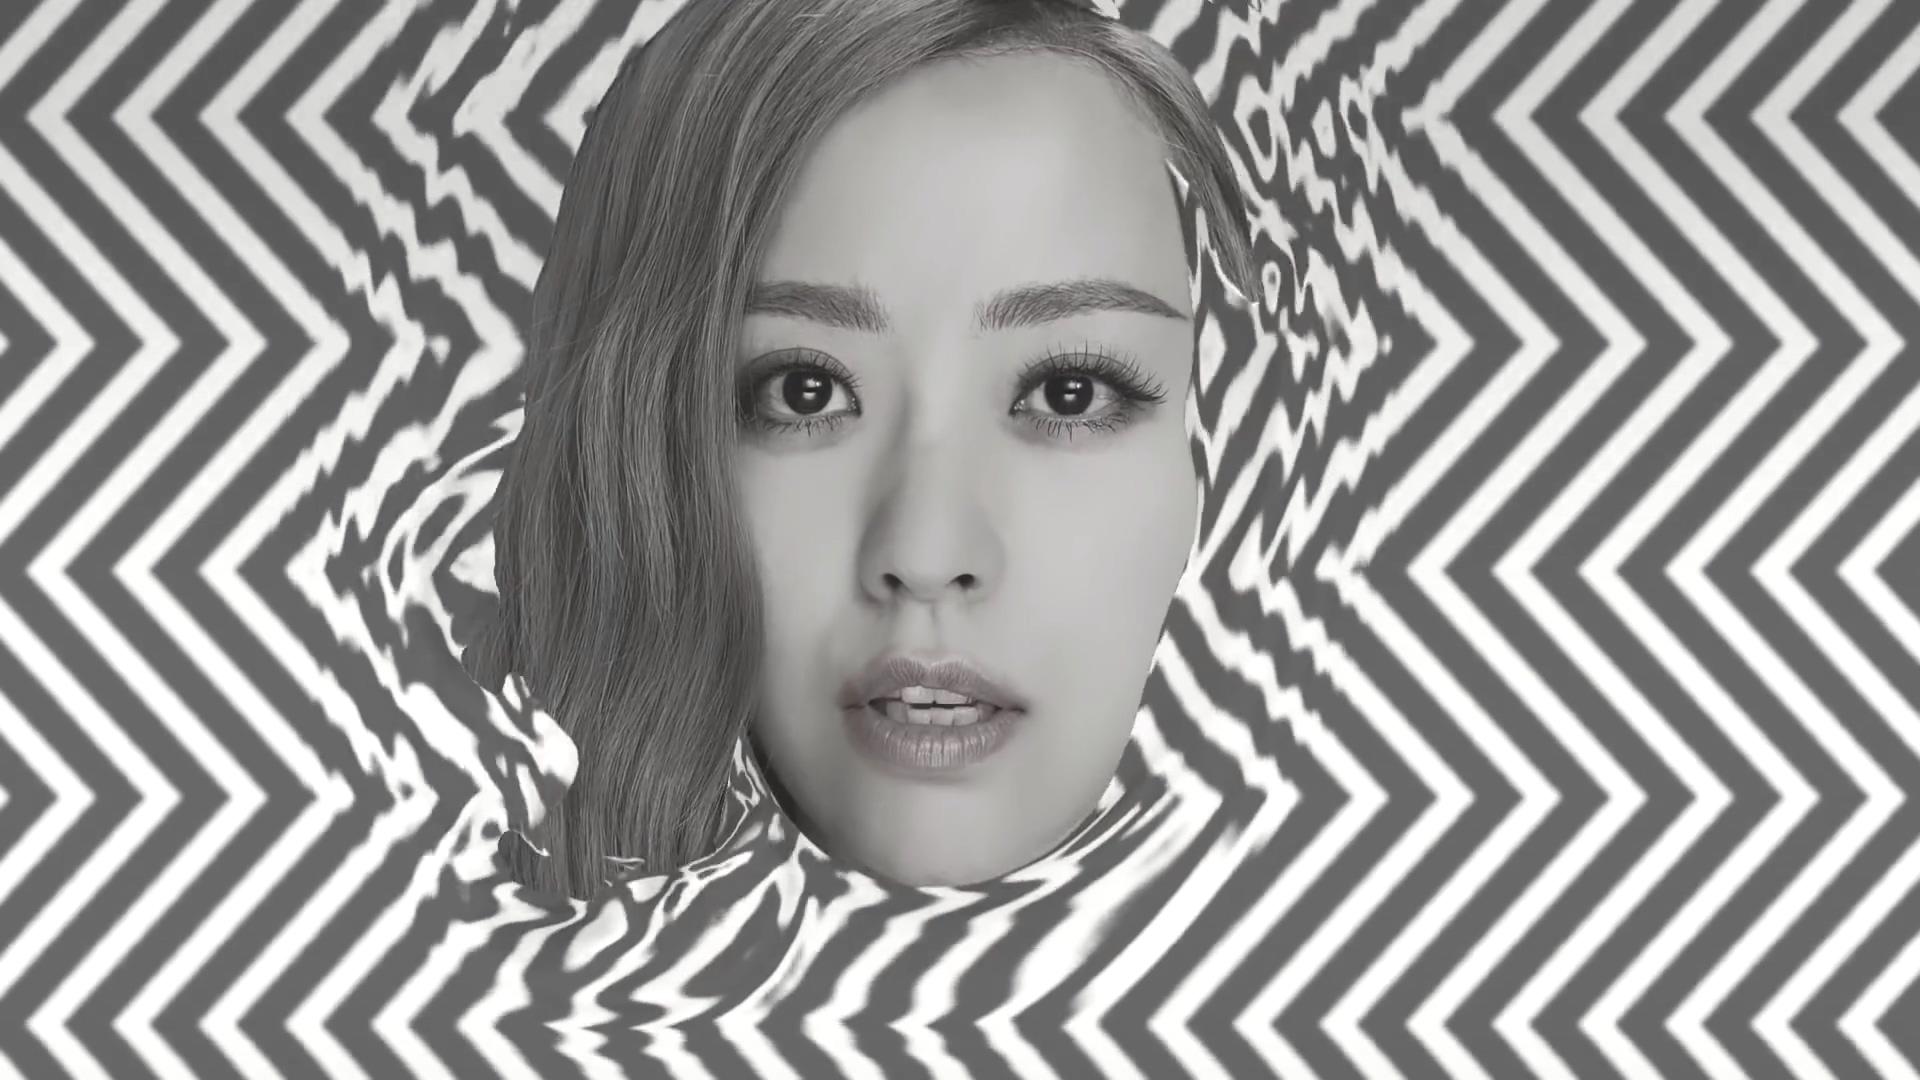 Jane Zhang Body First Music Video